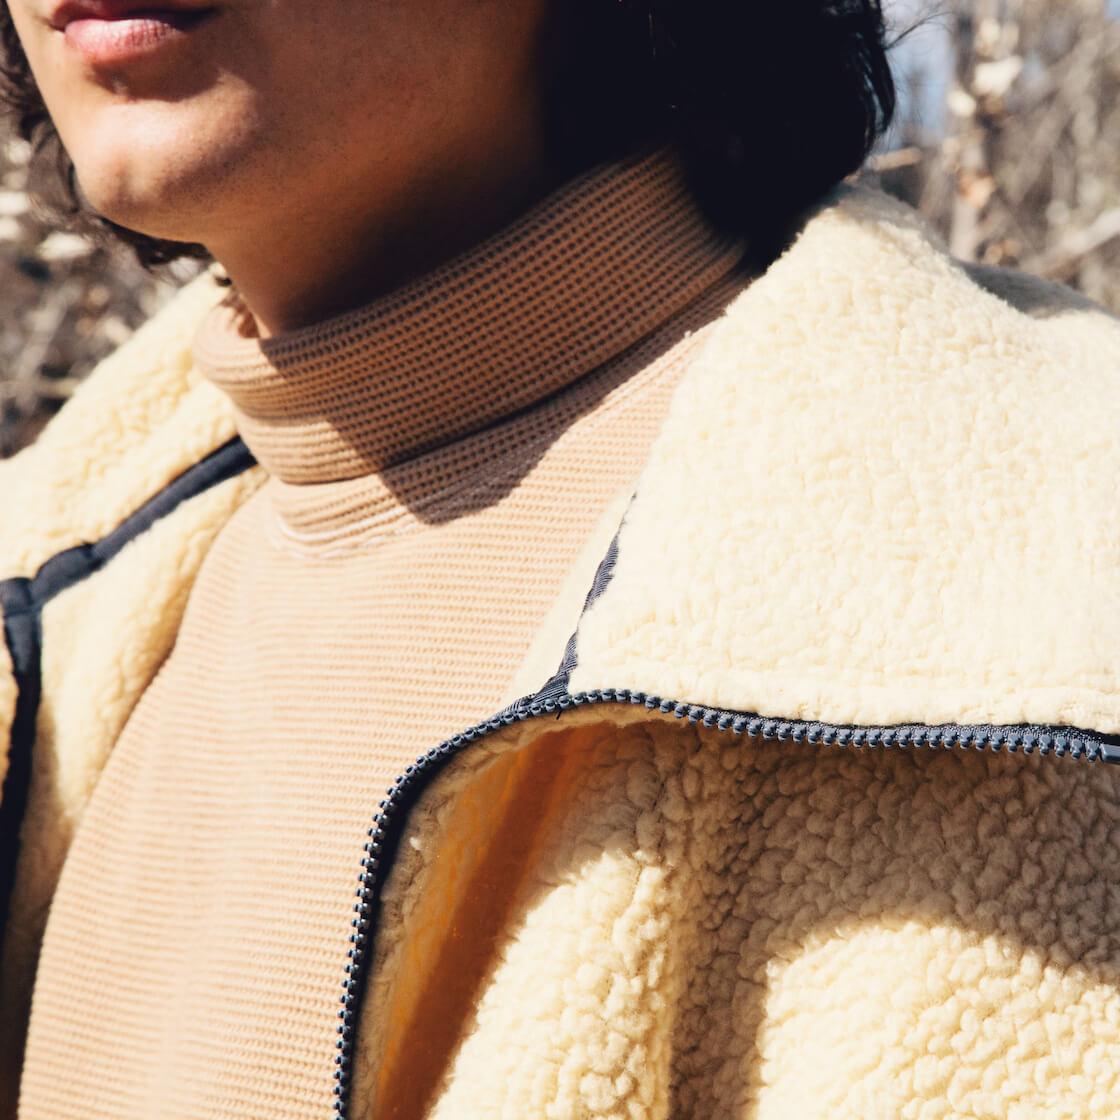 nanamica fleece jacket and turtle neck shirt on body